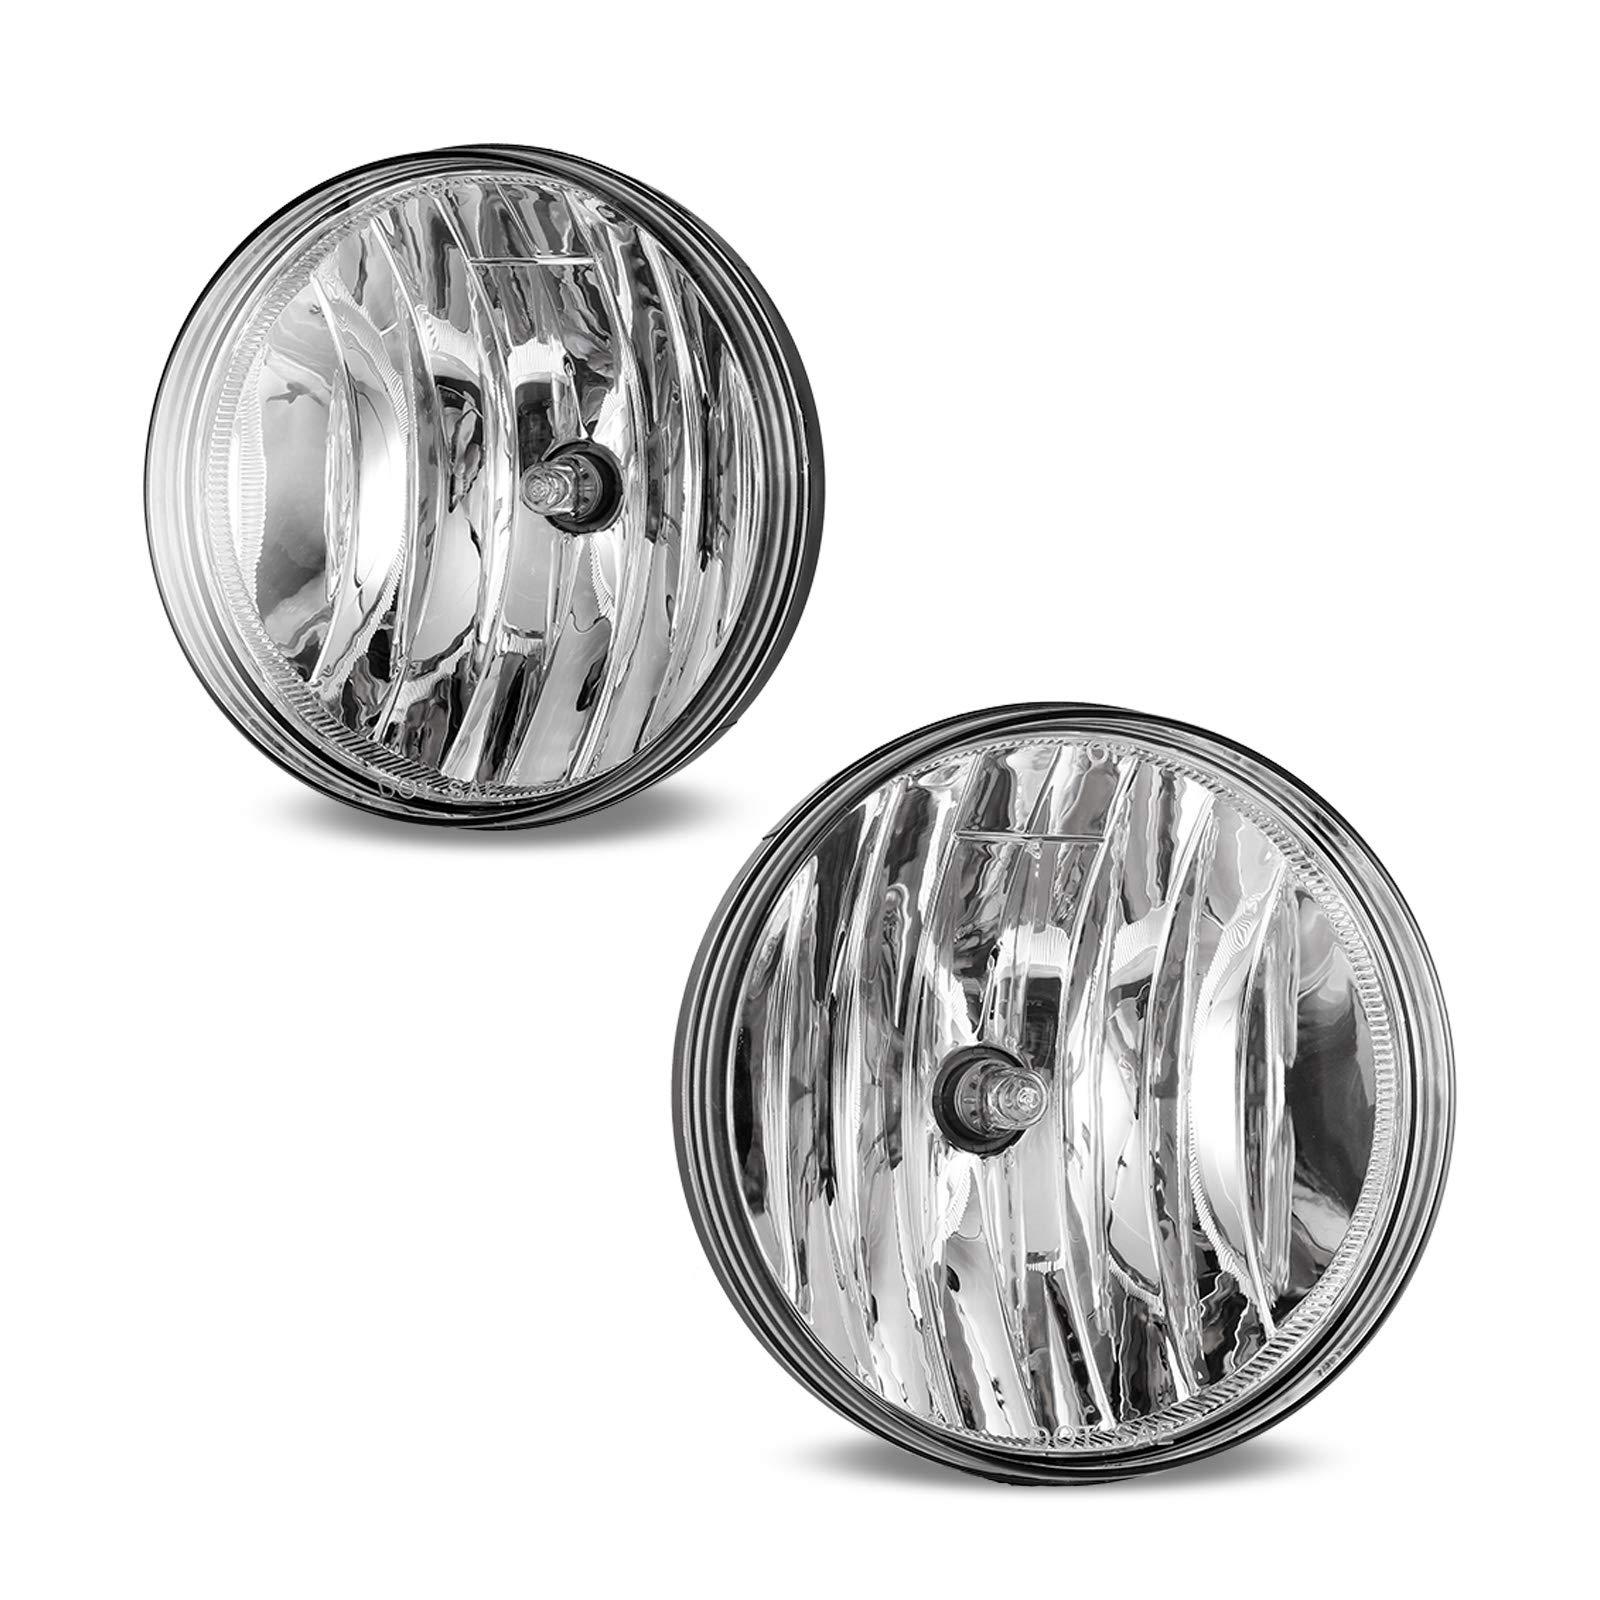 Fog Lights Fit for 2007-2013 GMC Sierra 1500, 2007-2014 Sierra 2500 HD/3500 HD (Not Fit Classic Models) 2PCS AUTOWIKI